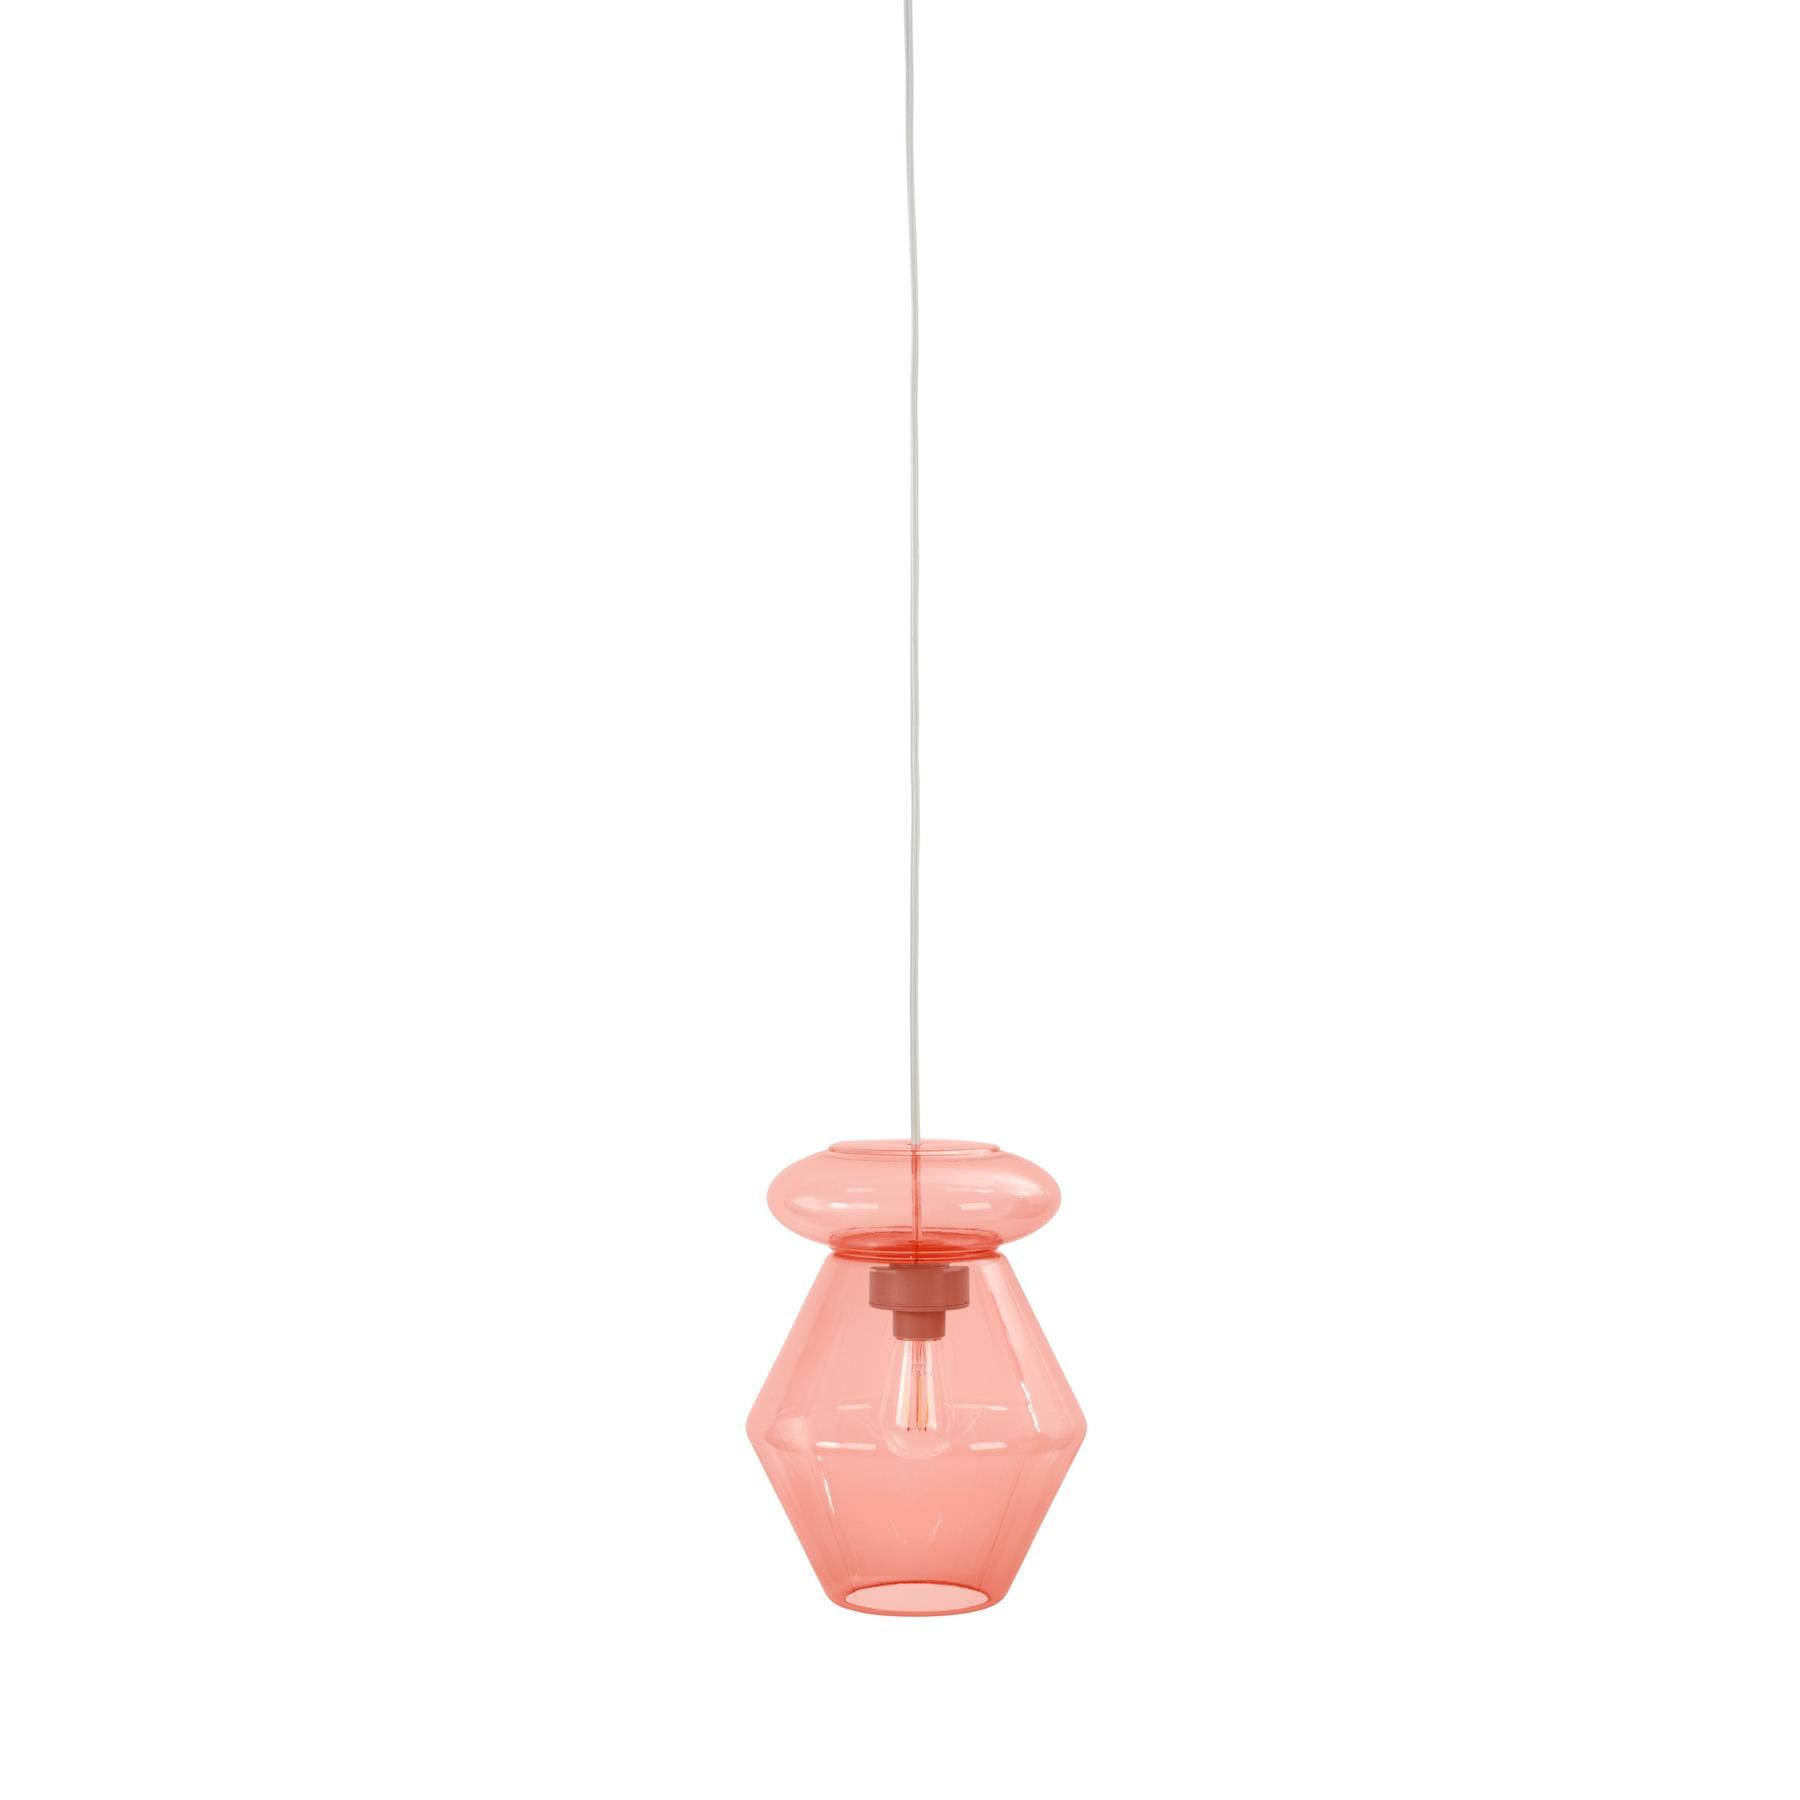 Fatboy Candyofnie 2 Set 27 Hanglamp In 2020 Hanglamp Lampen Fitting